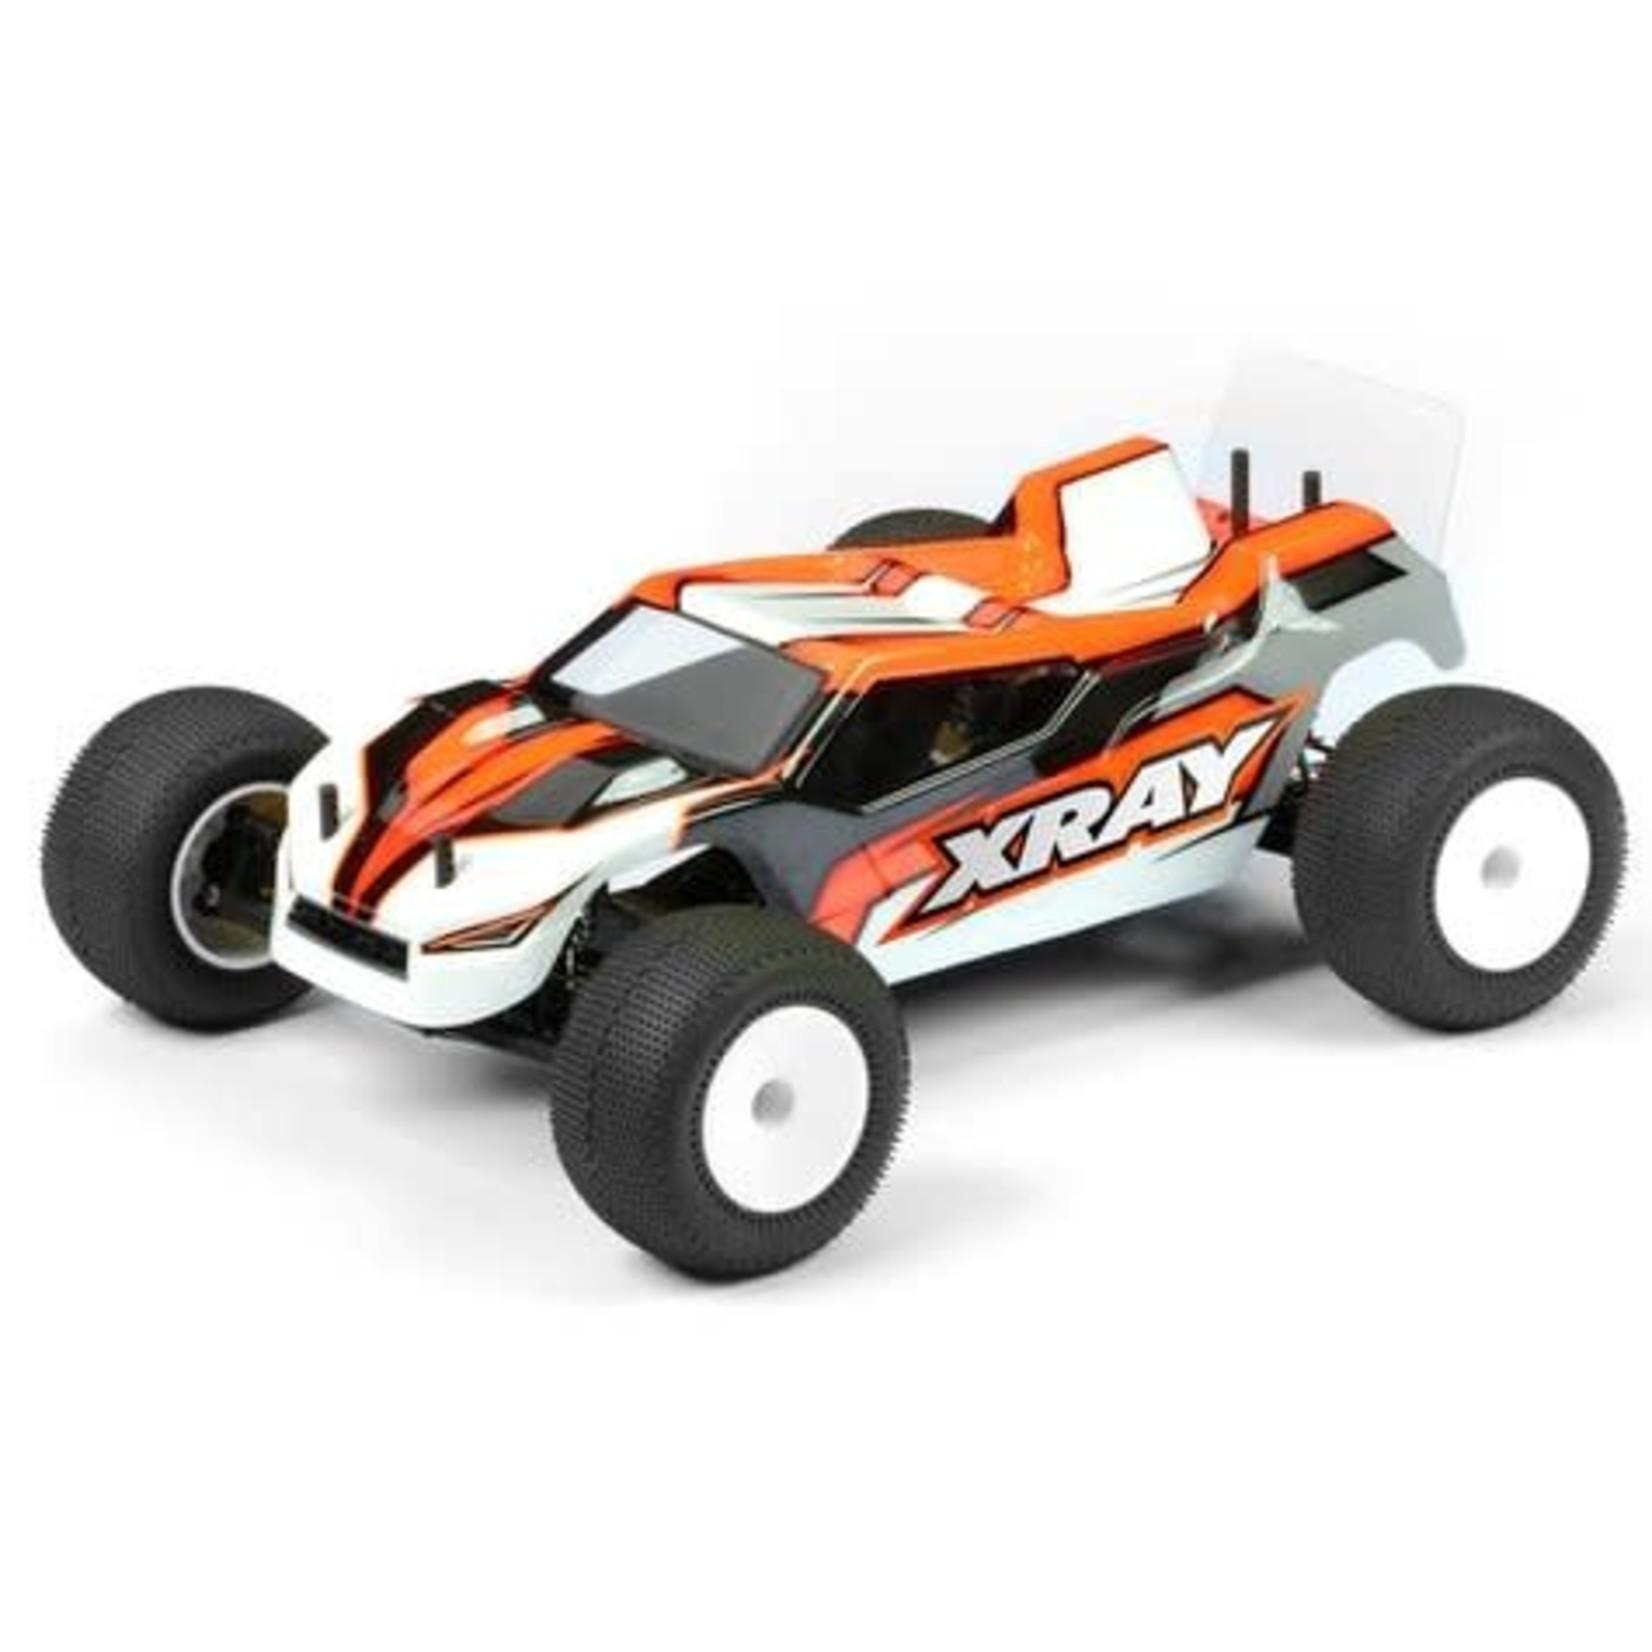 XRAY XRAY XT2C'21 - 2WD 1 / 10 ELECTRIC STADIUM TRUCK